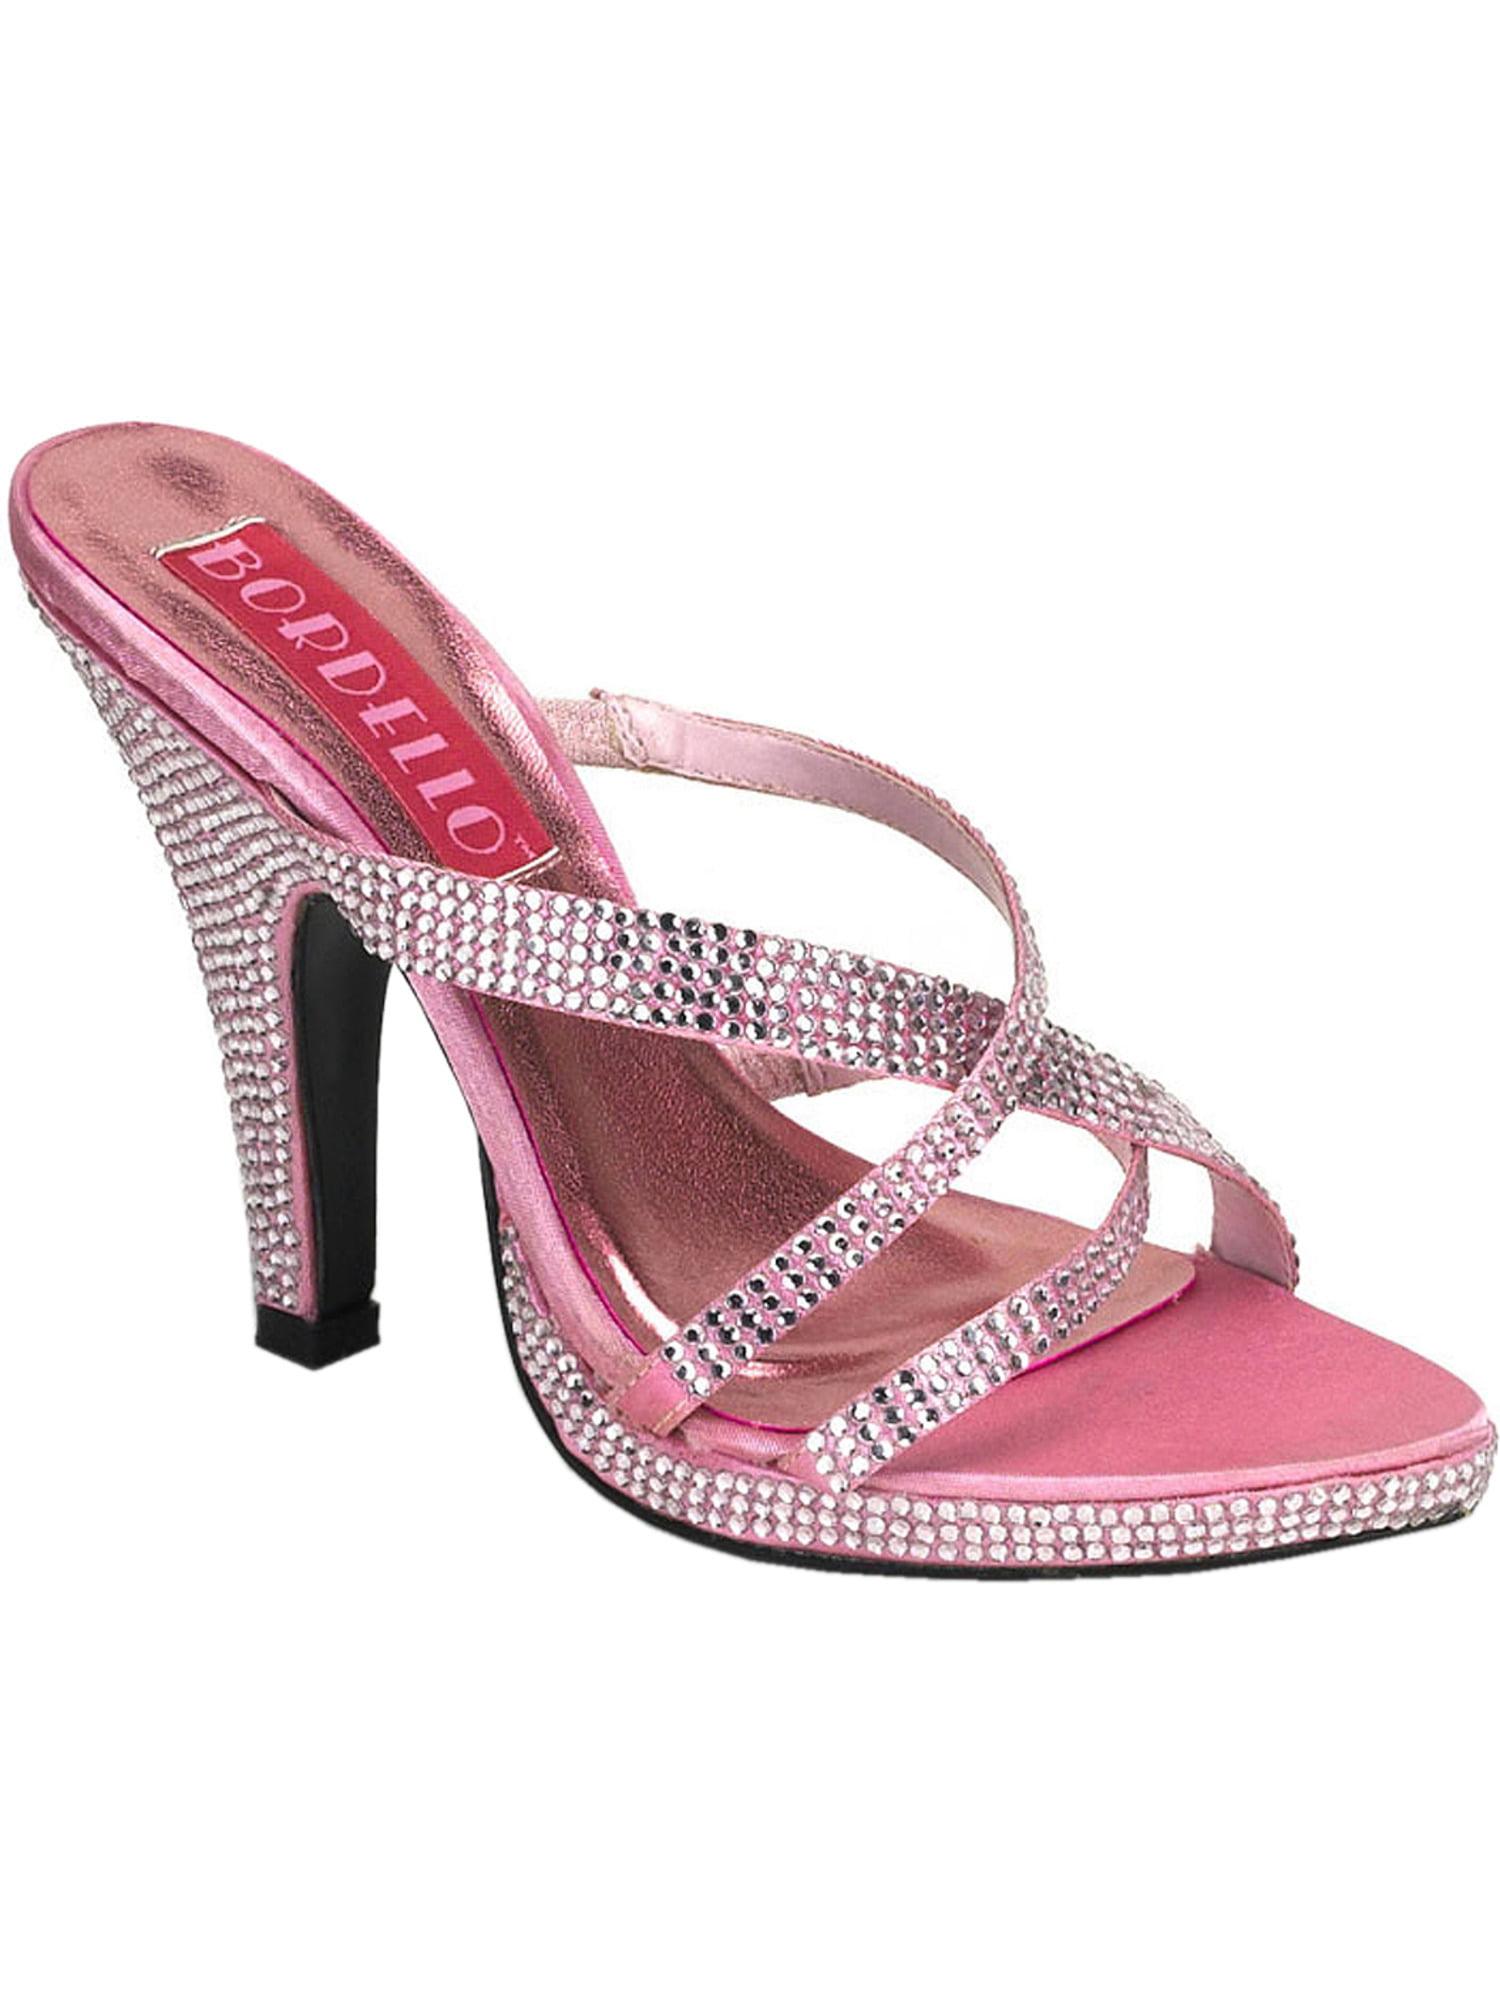 Womens 4 Inch Heels Rhinestone Slide Shoes Slip On Criss Cross Pink Sandals